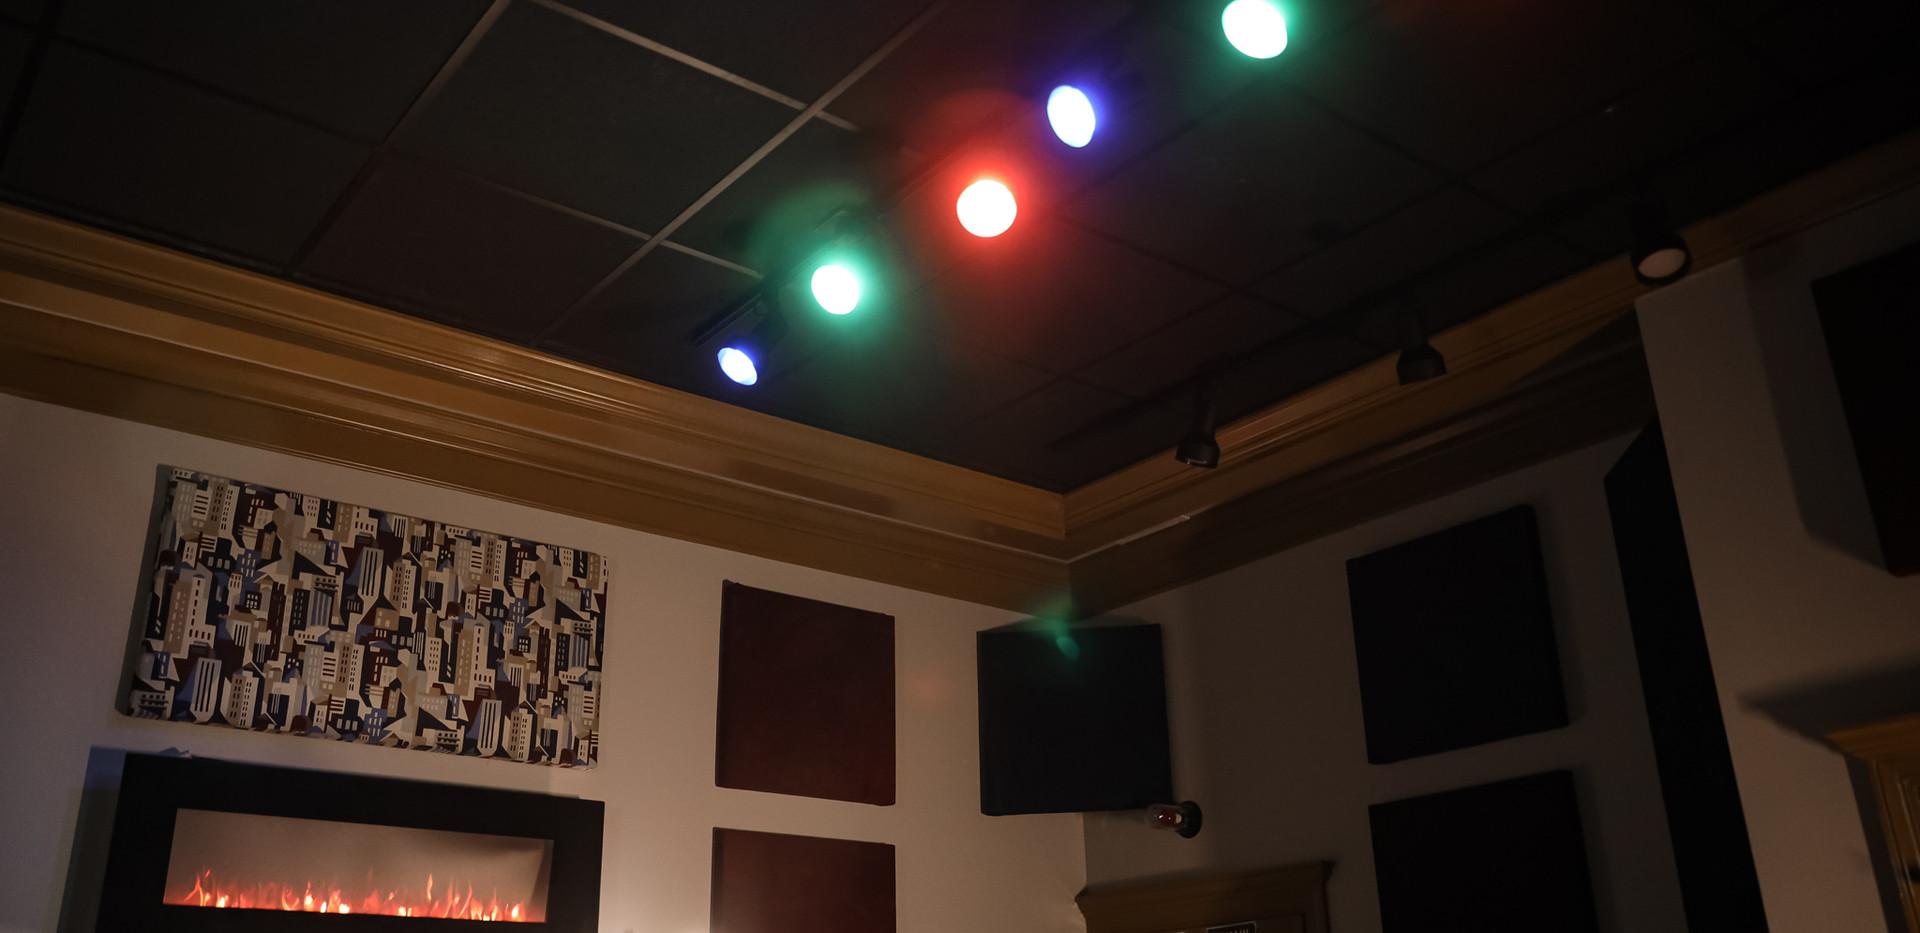 The Parlor - Ridenour Rehearsal Studios